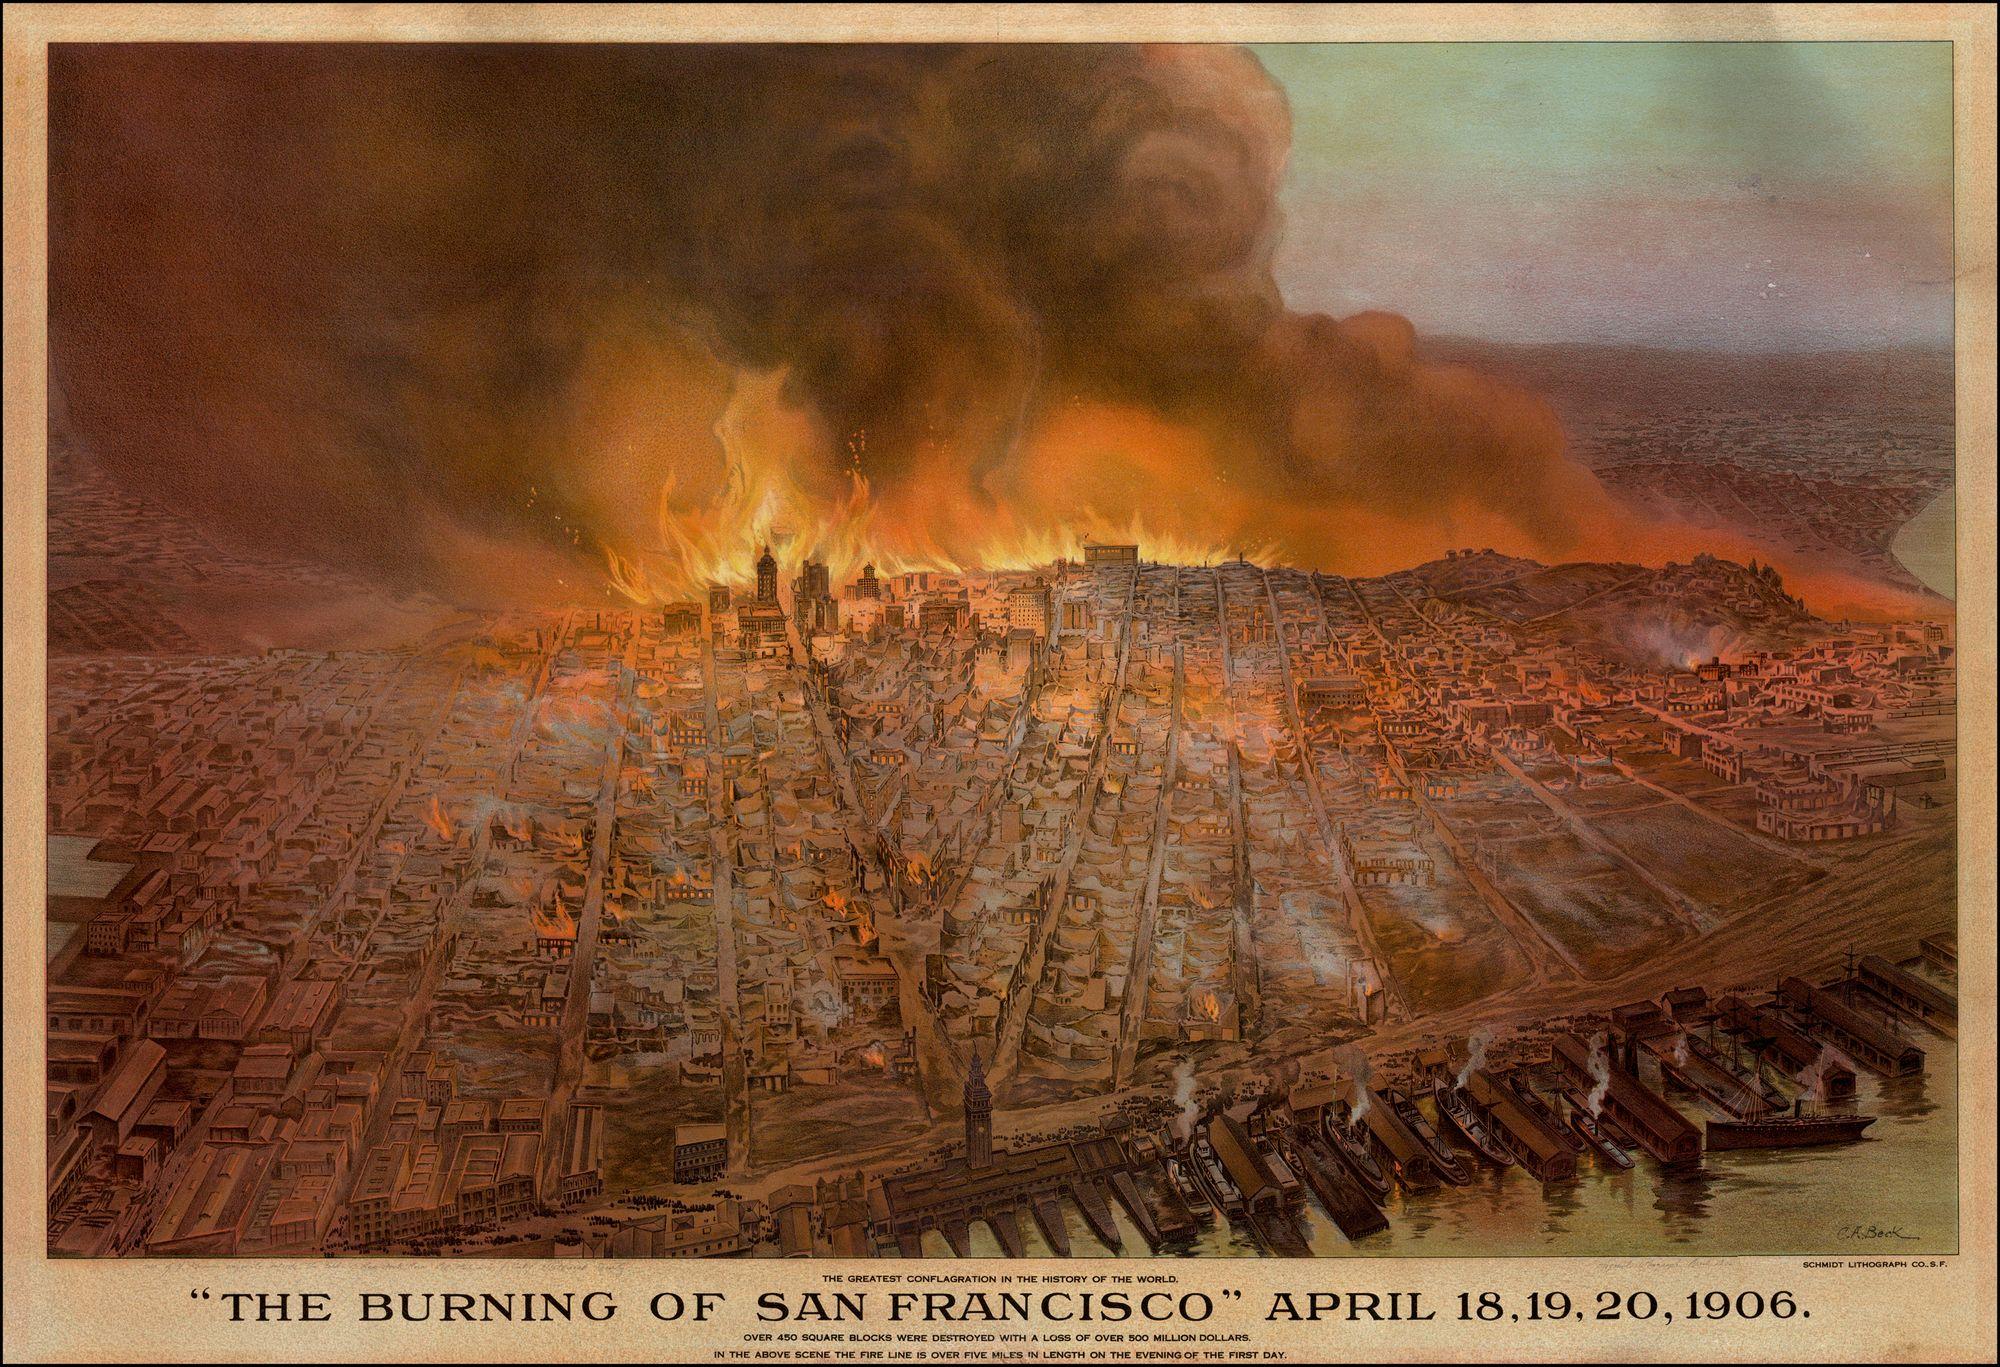 The Burning of San Francisco 1906: Rare Maps